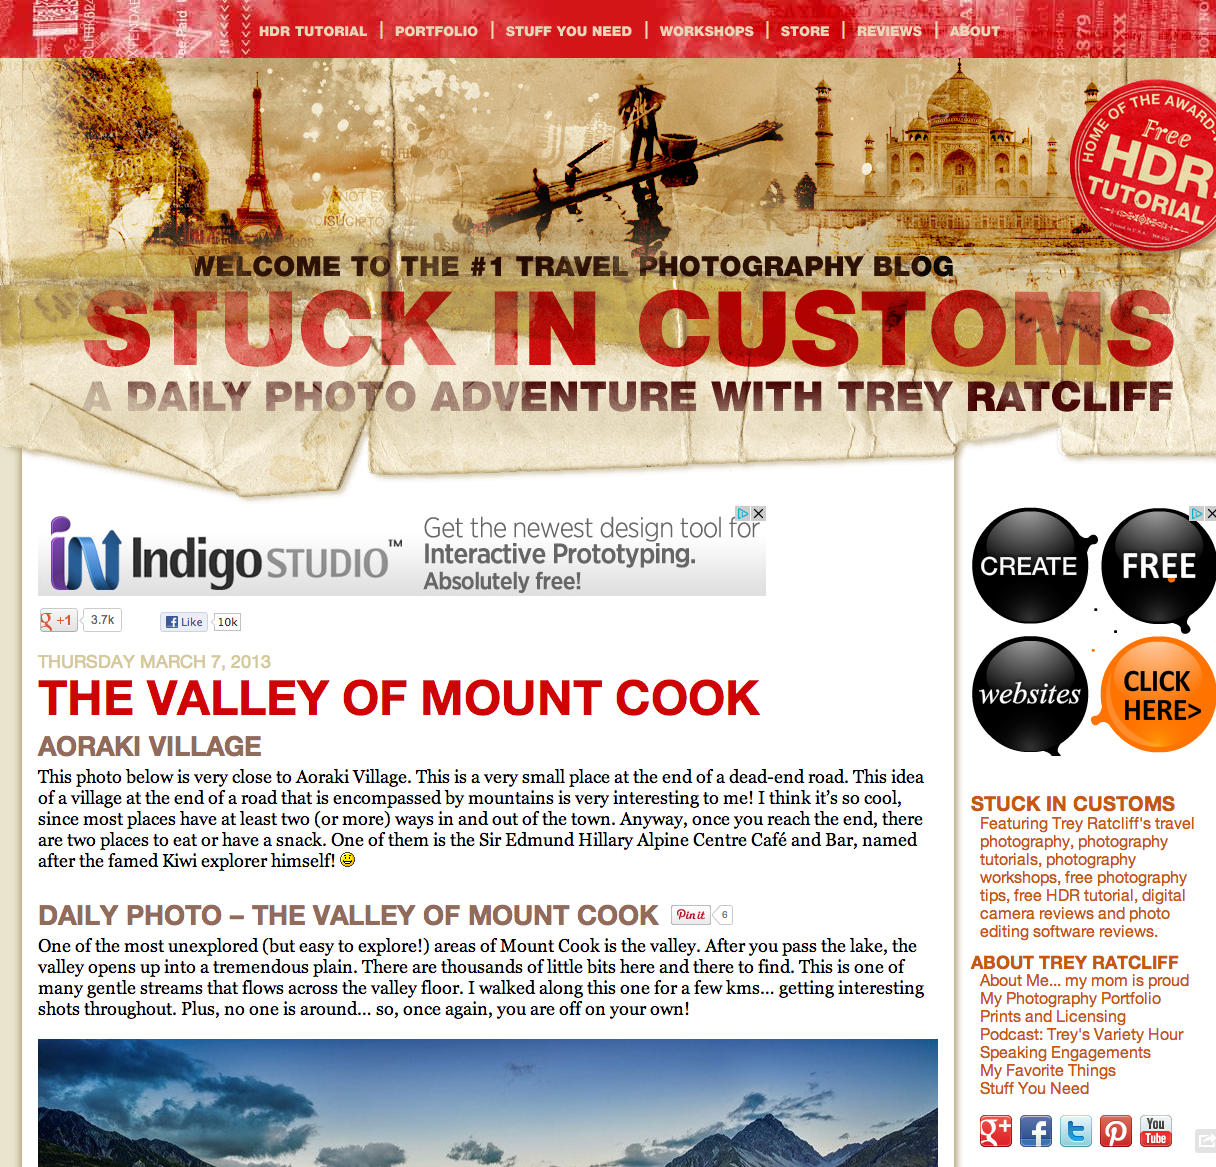 Stuck In Customs - Trey Ratclif